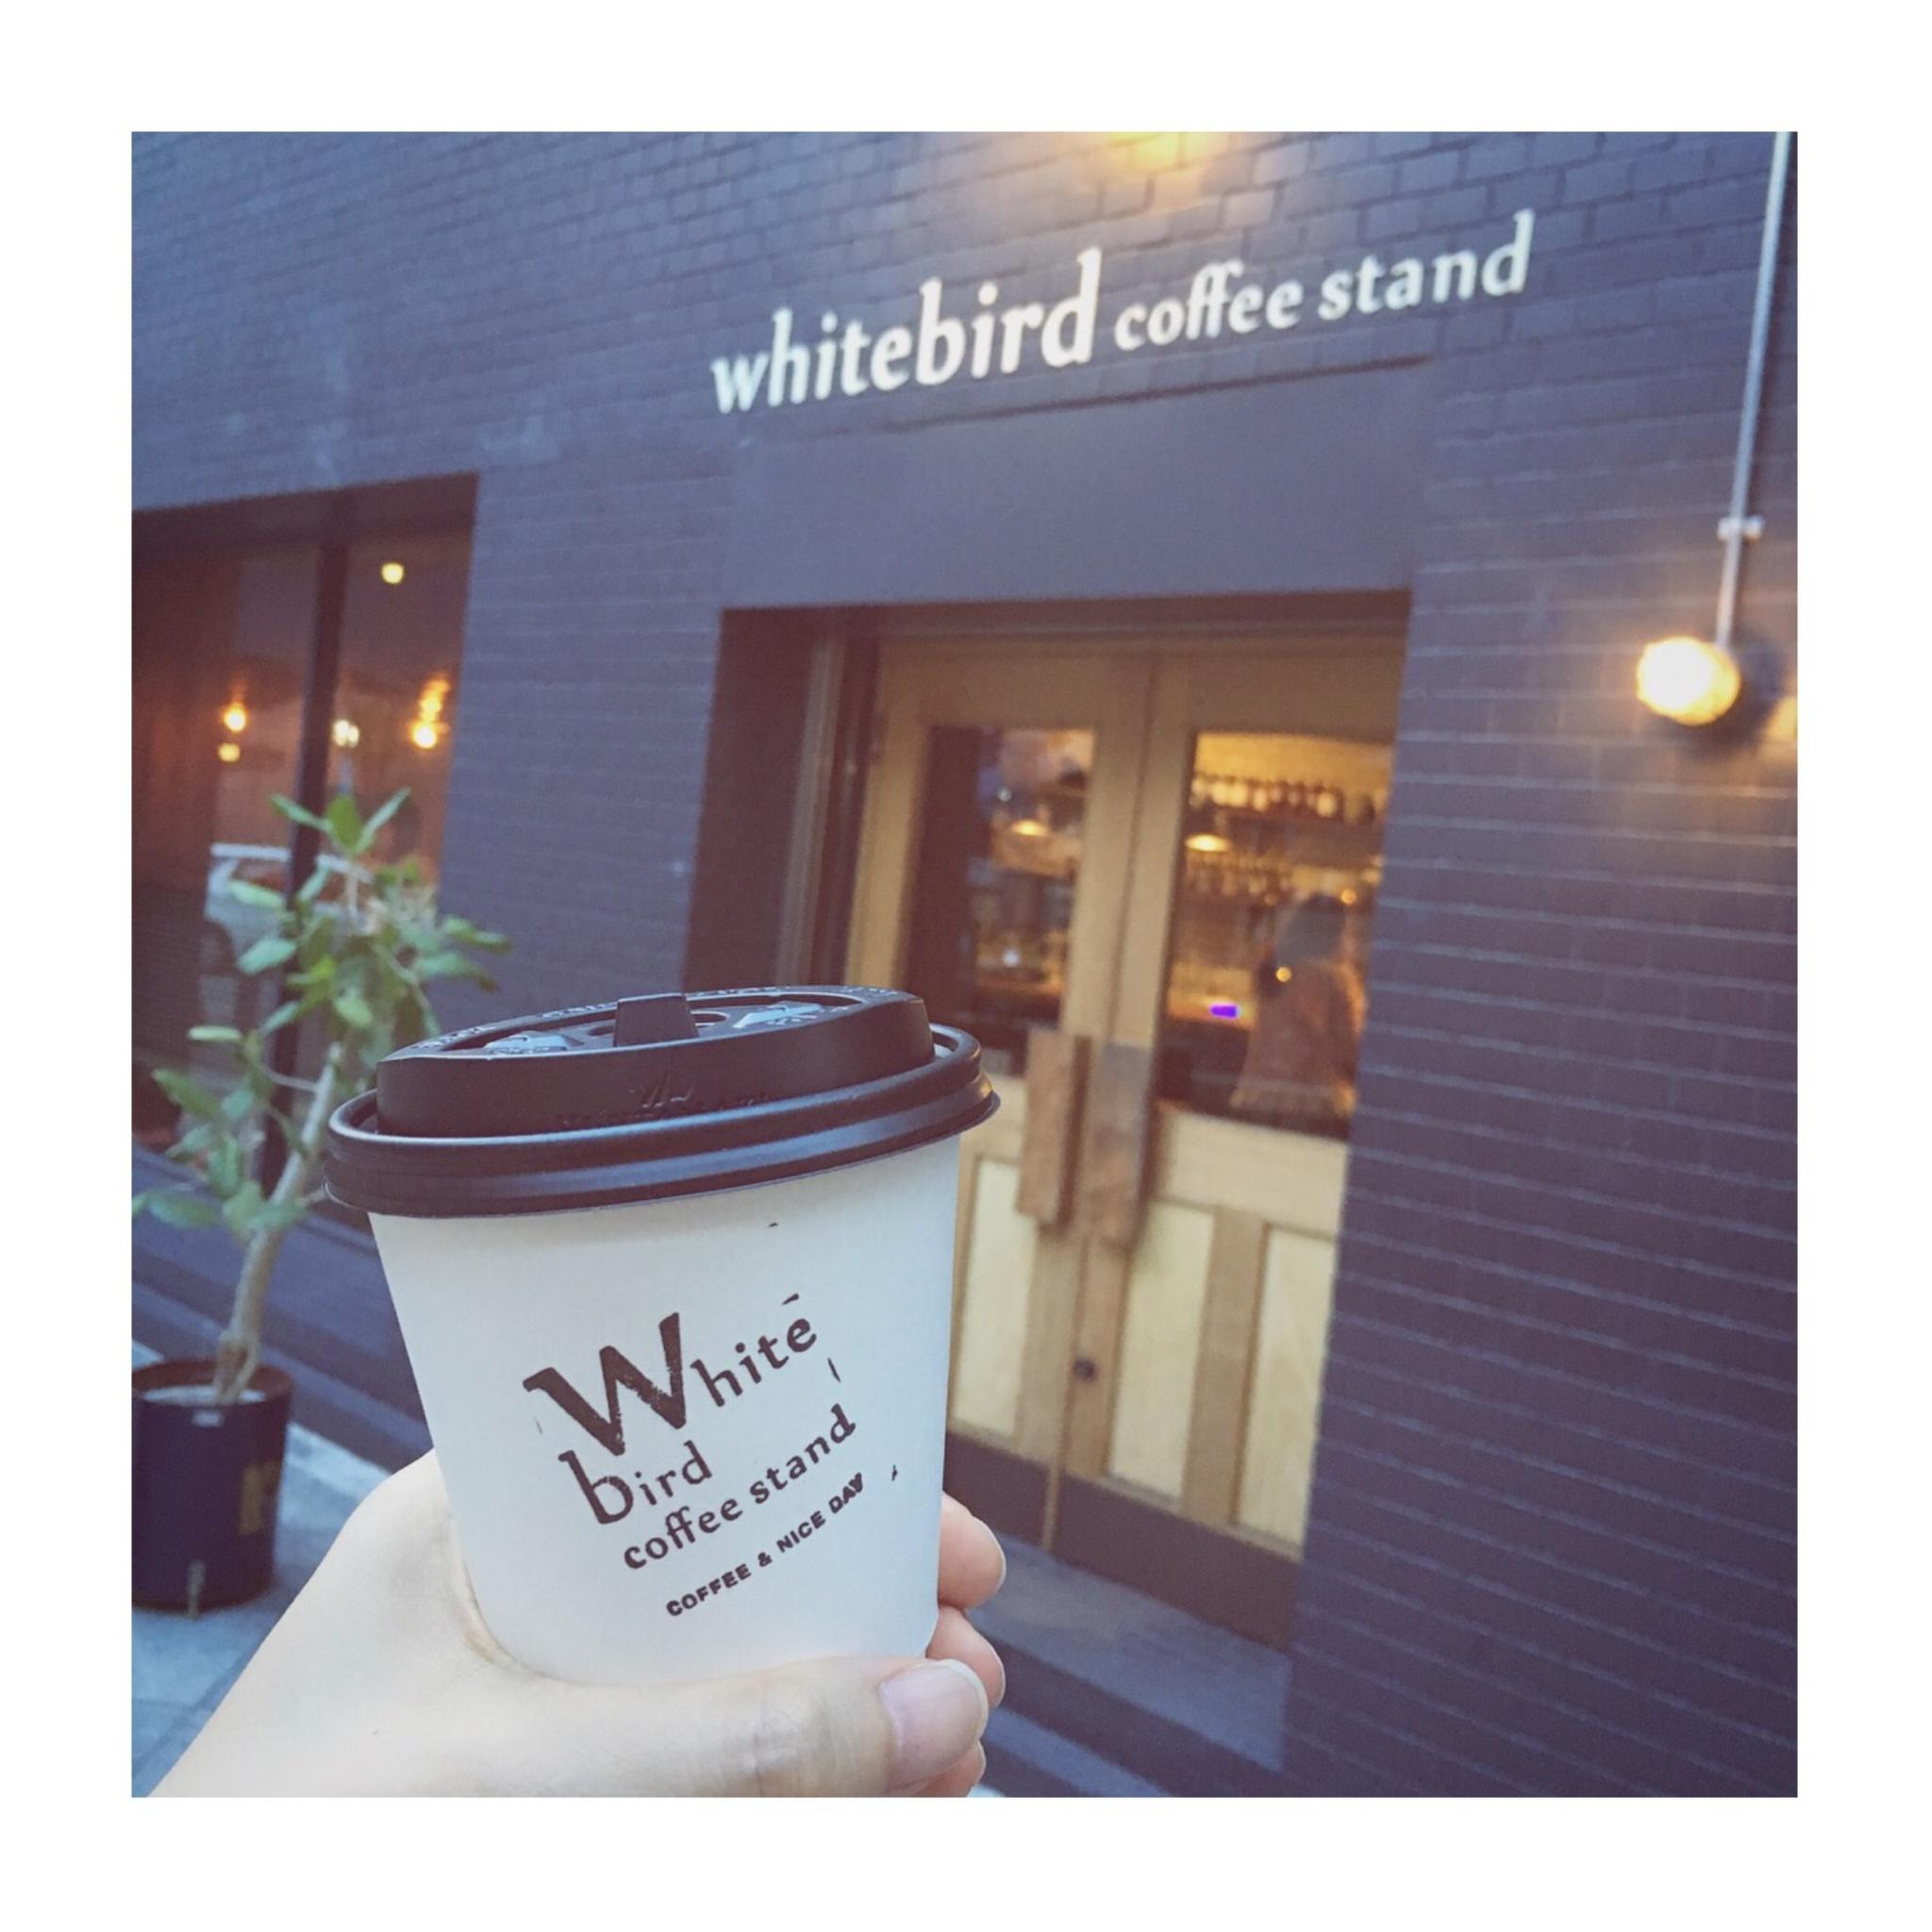 #7【#cafestagram】❤️:《大阪•梅田》バーのようなシックな空間で落ち着くカフェタイムを*「whitebird coffee stand」☻_1